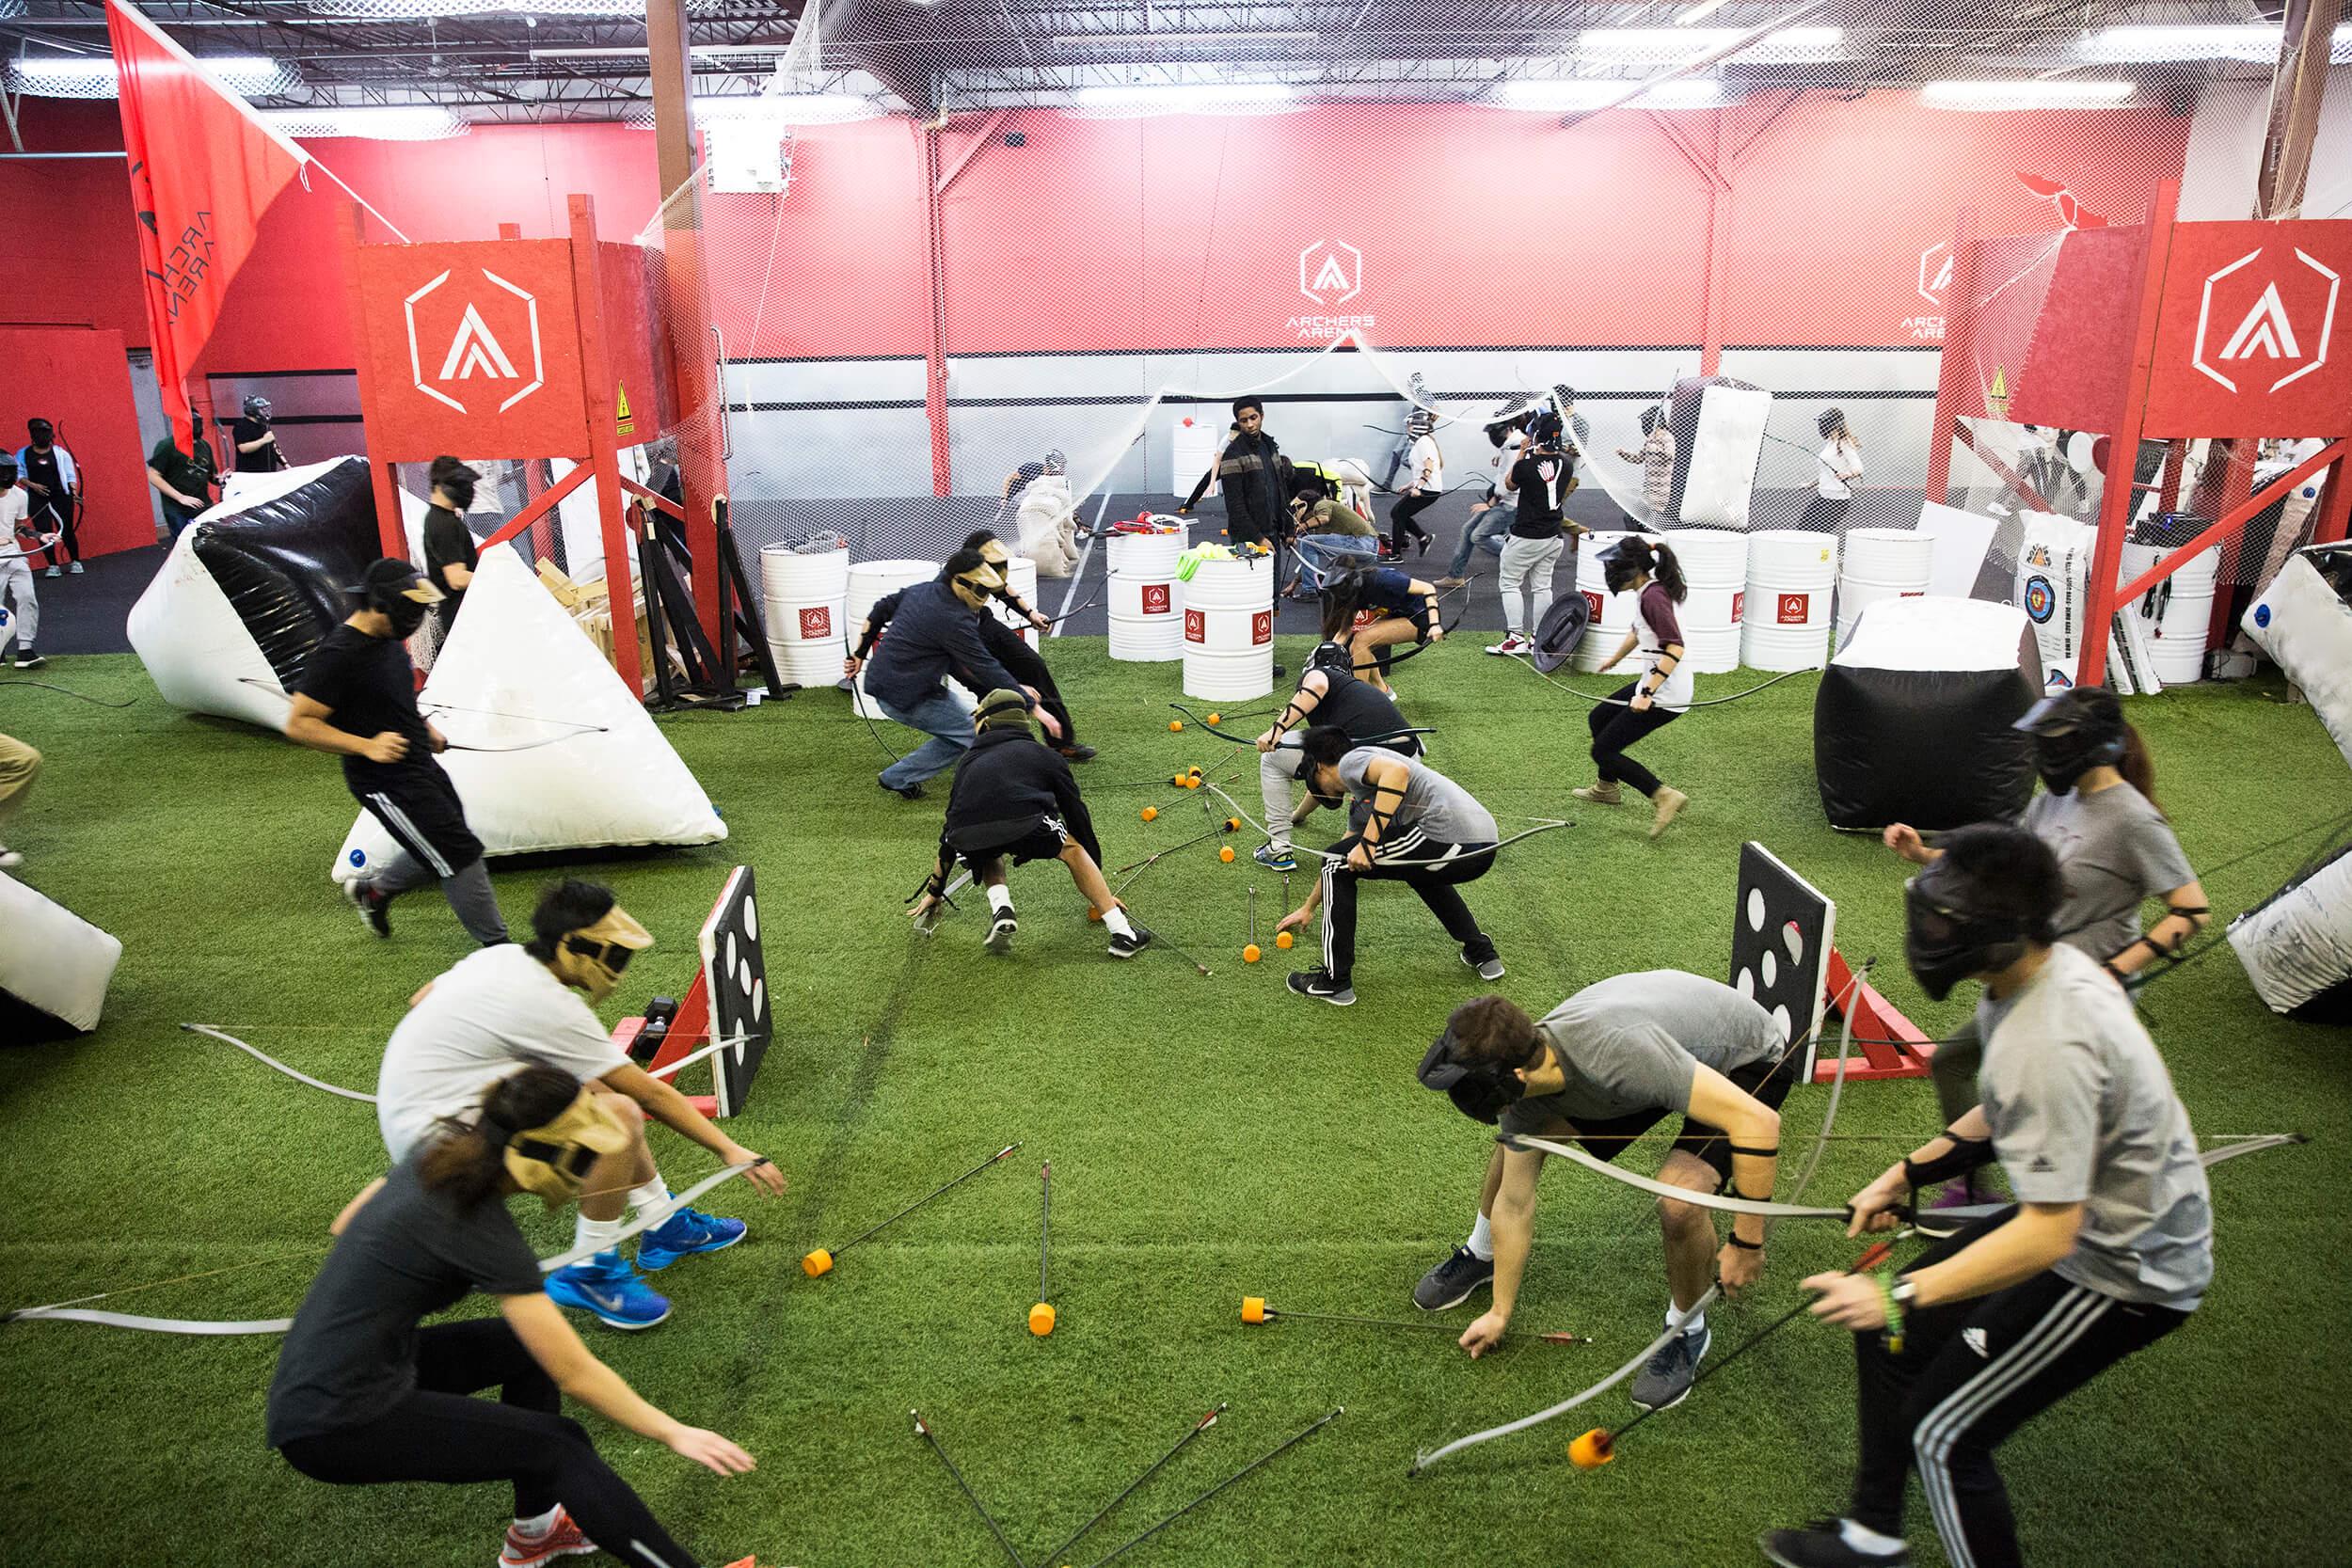 Combat-Archery-Toronto-b7ss.jpg